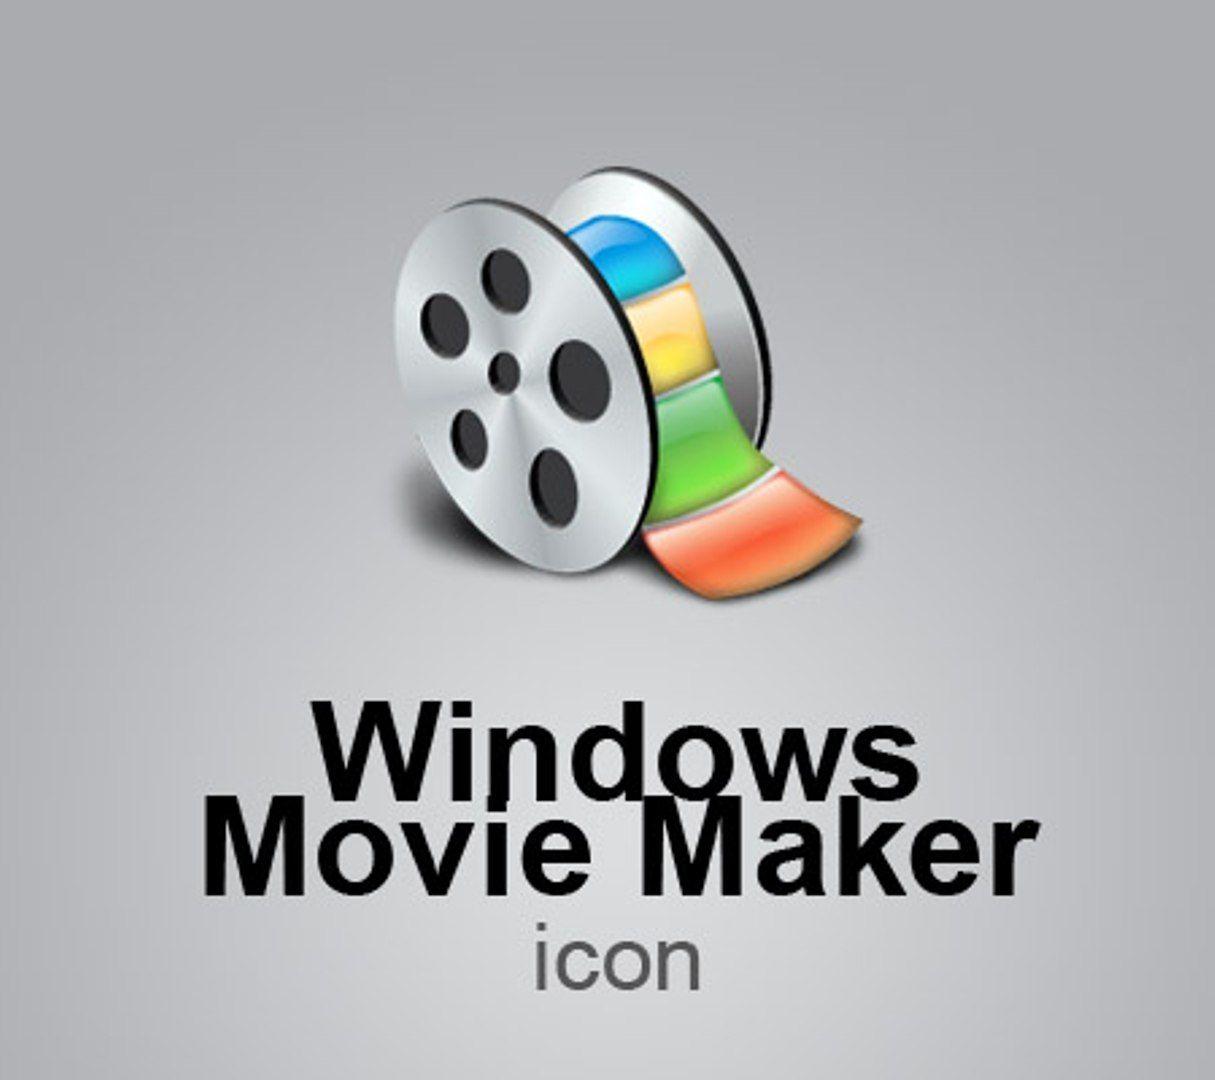 Windows Movie Maker 10 2021 Crack + Activation Code [Latest Software]